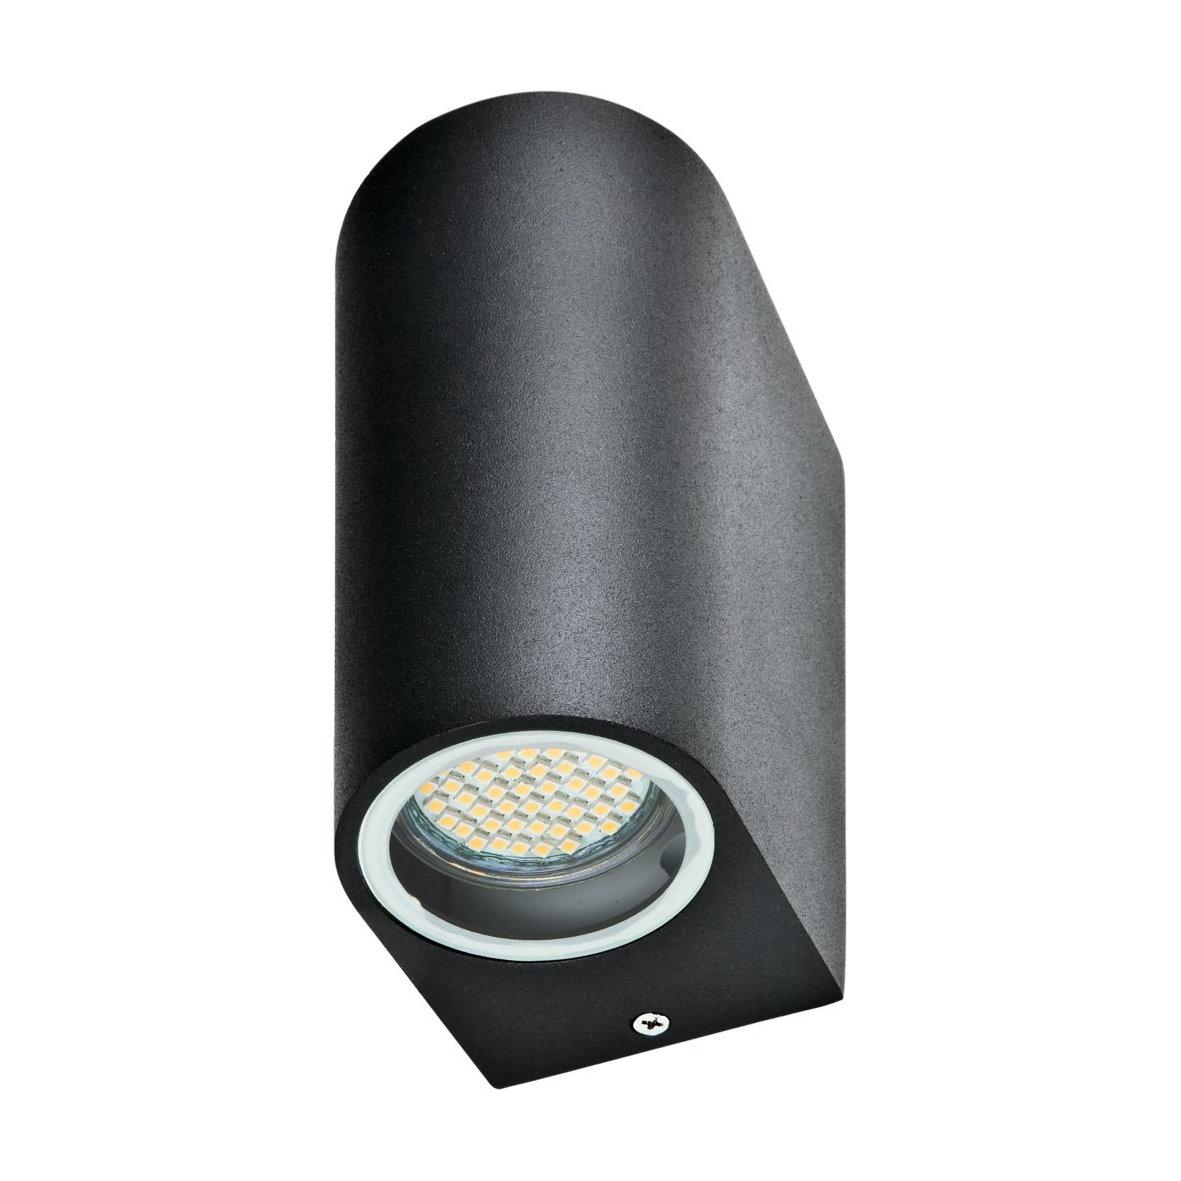 feuchtraum wandleuchte gu10 wandstrahler spot lampe wand. Black Bedroom Furniture Sets. Home Design Ideas